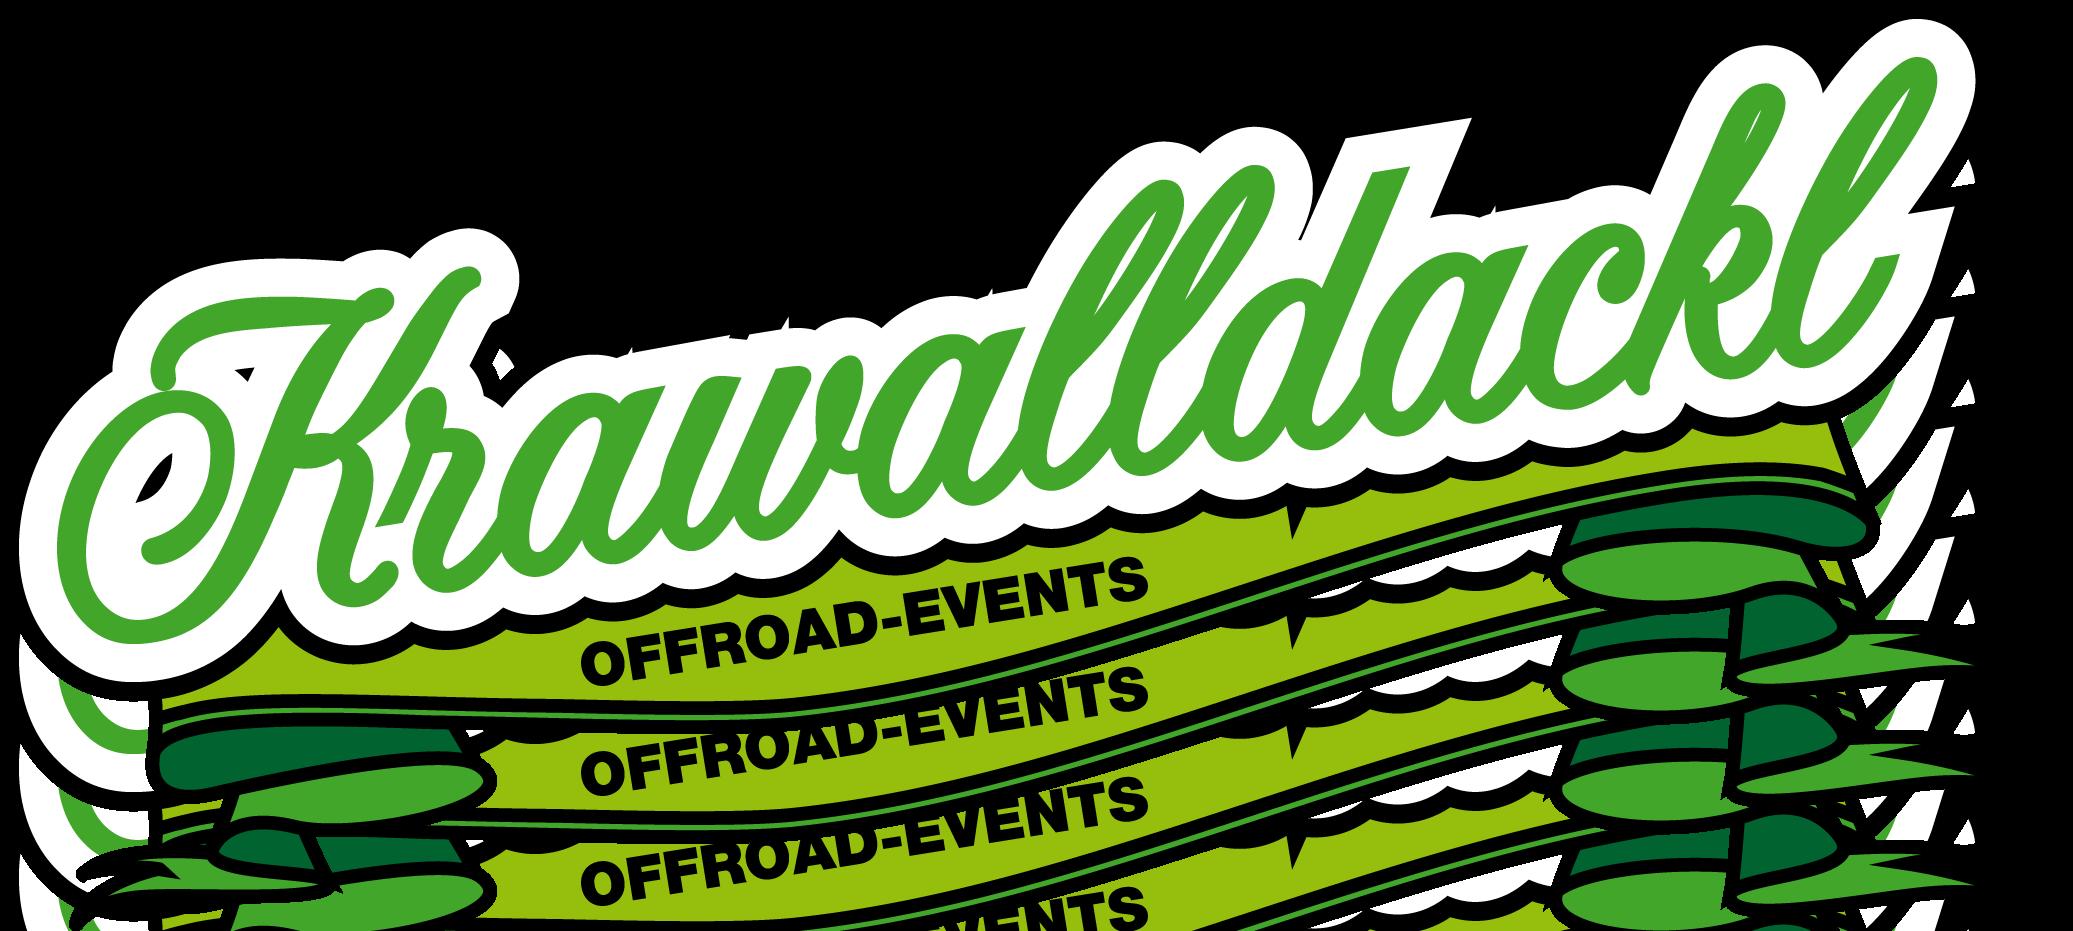 Krawalldackl Offroad-Events